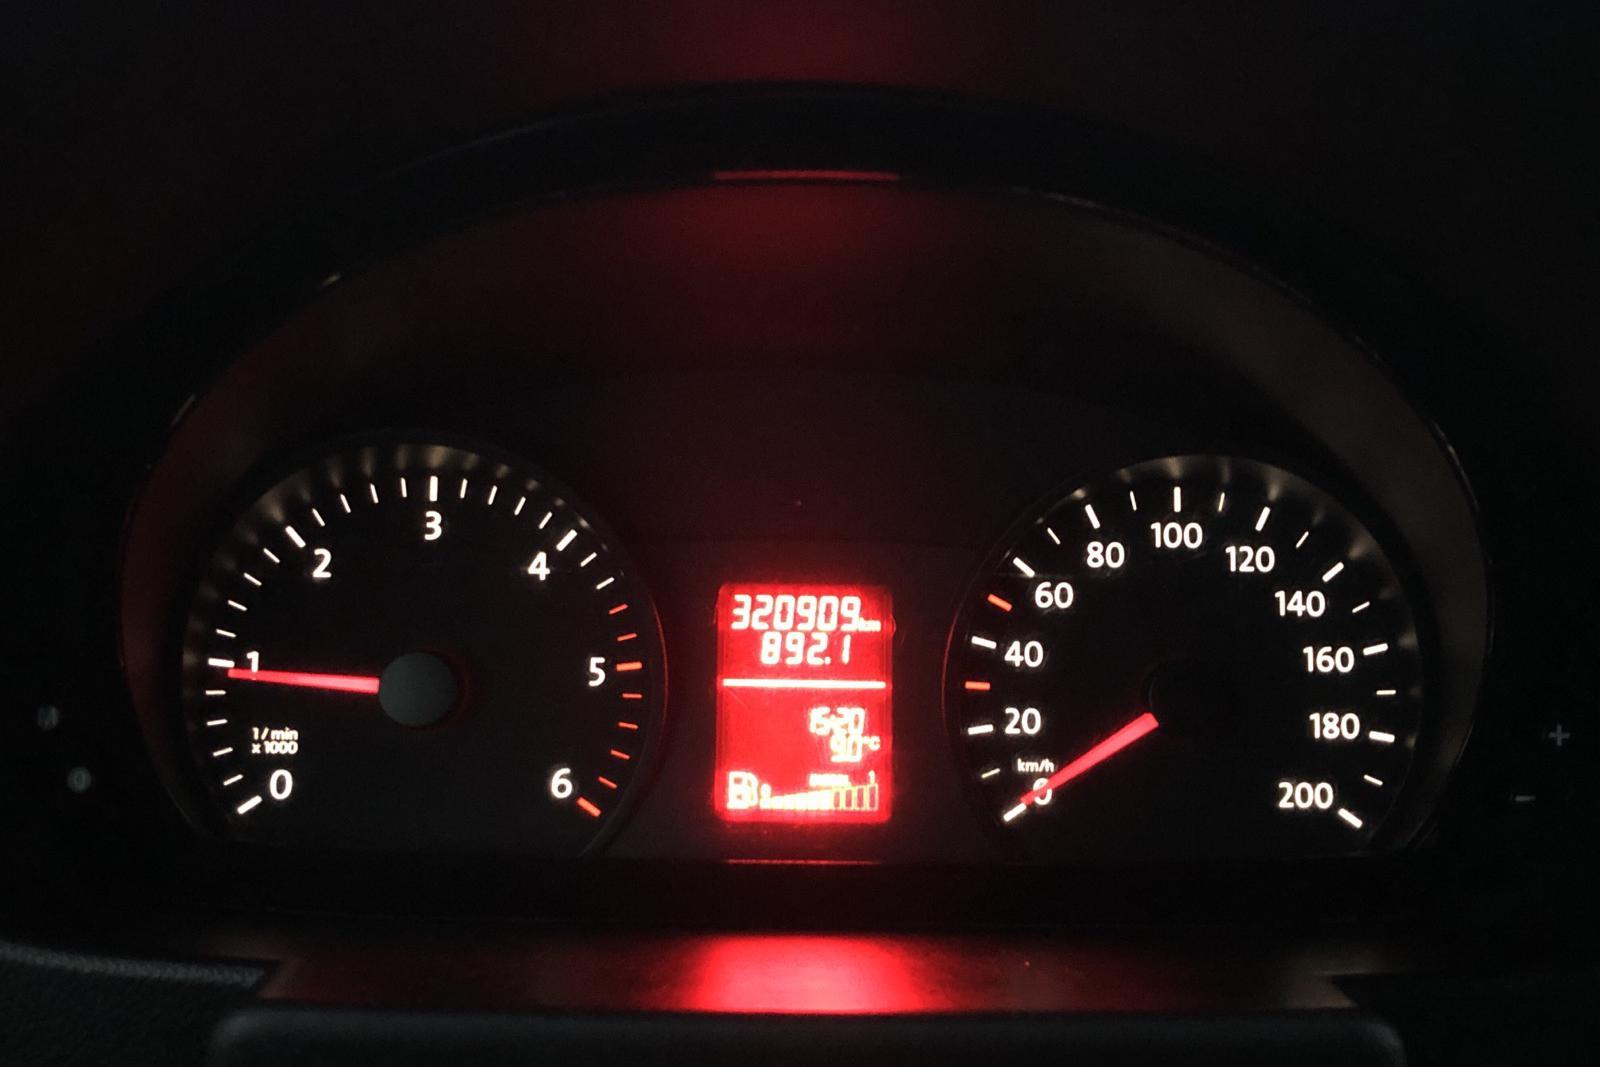 VW Crafter 35 2.0 TDI Volymskåp (163hk) - 320 900 km - Manual - white - 2015